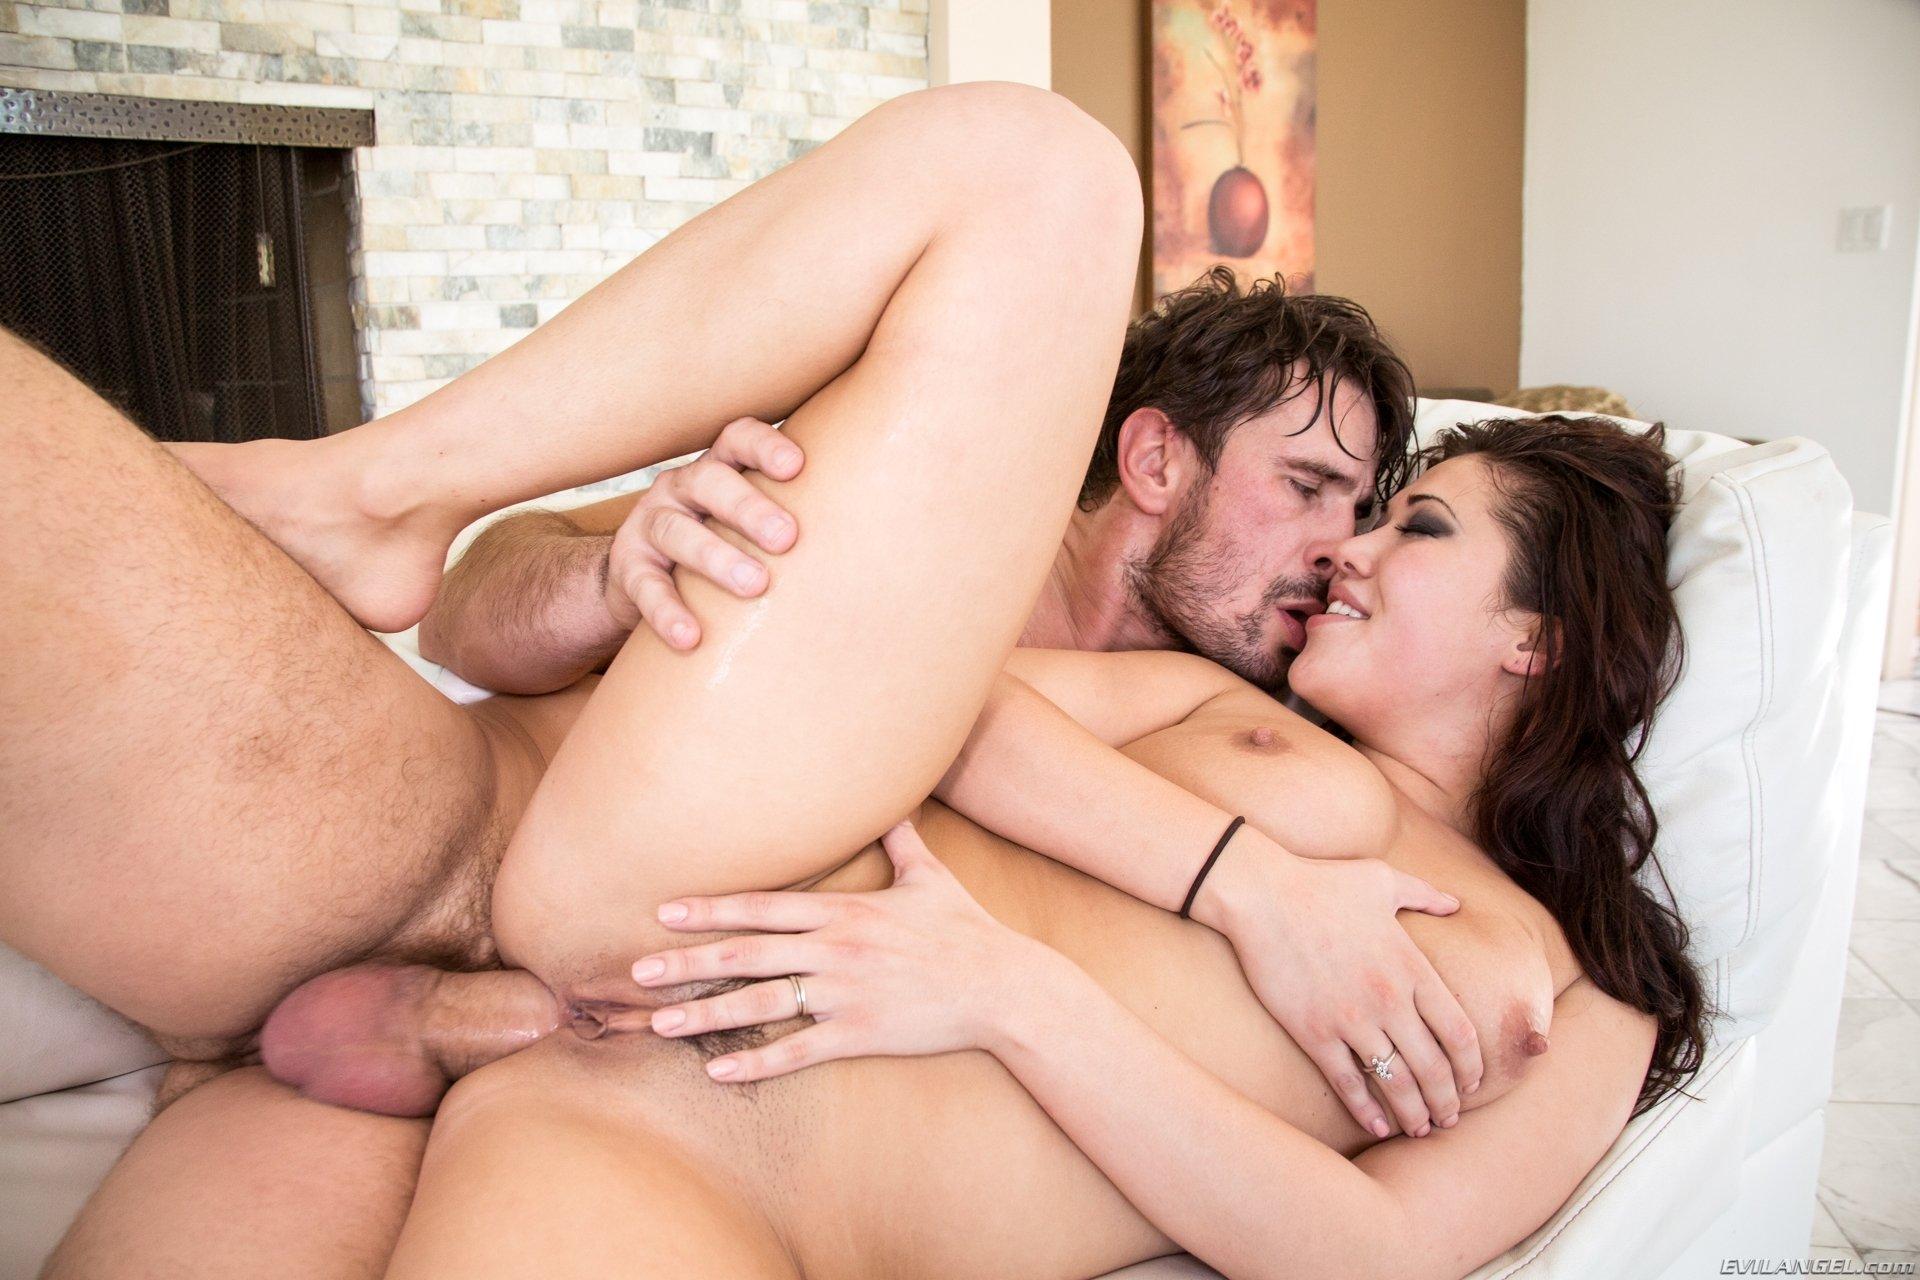 Спермой в глаз - Порно фото галерея 935445